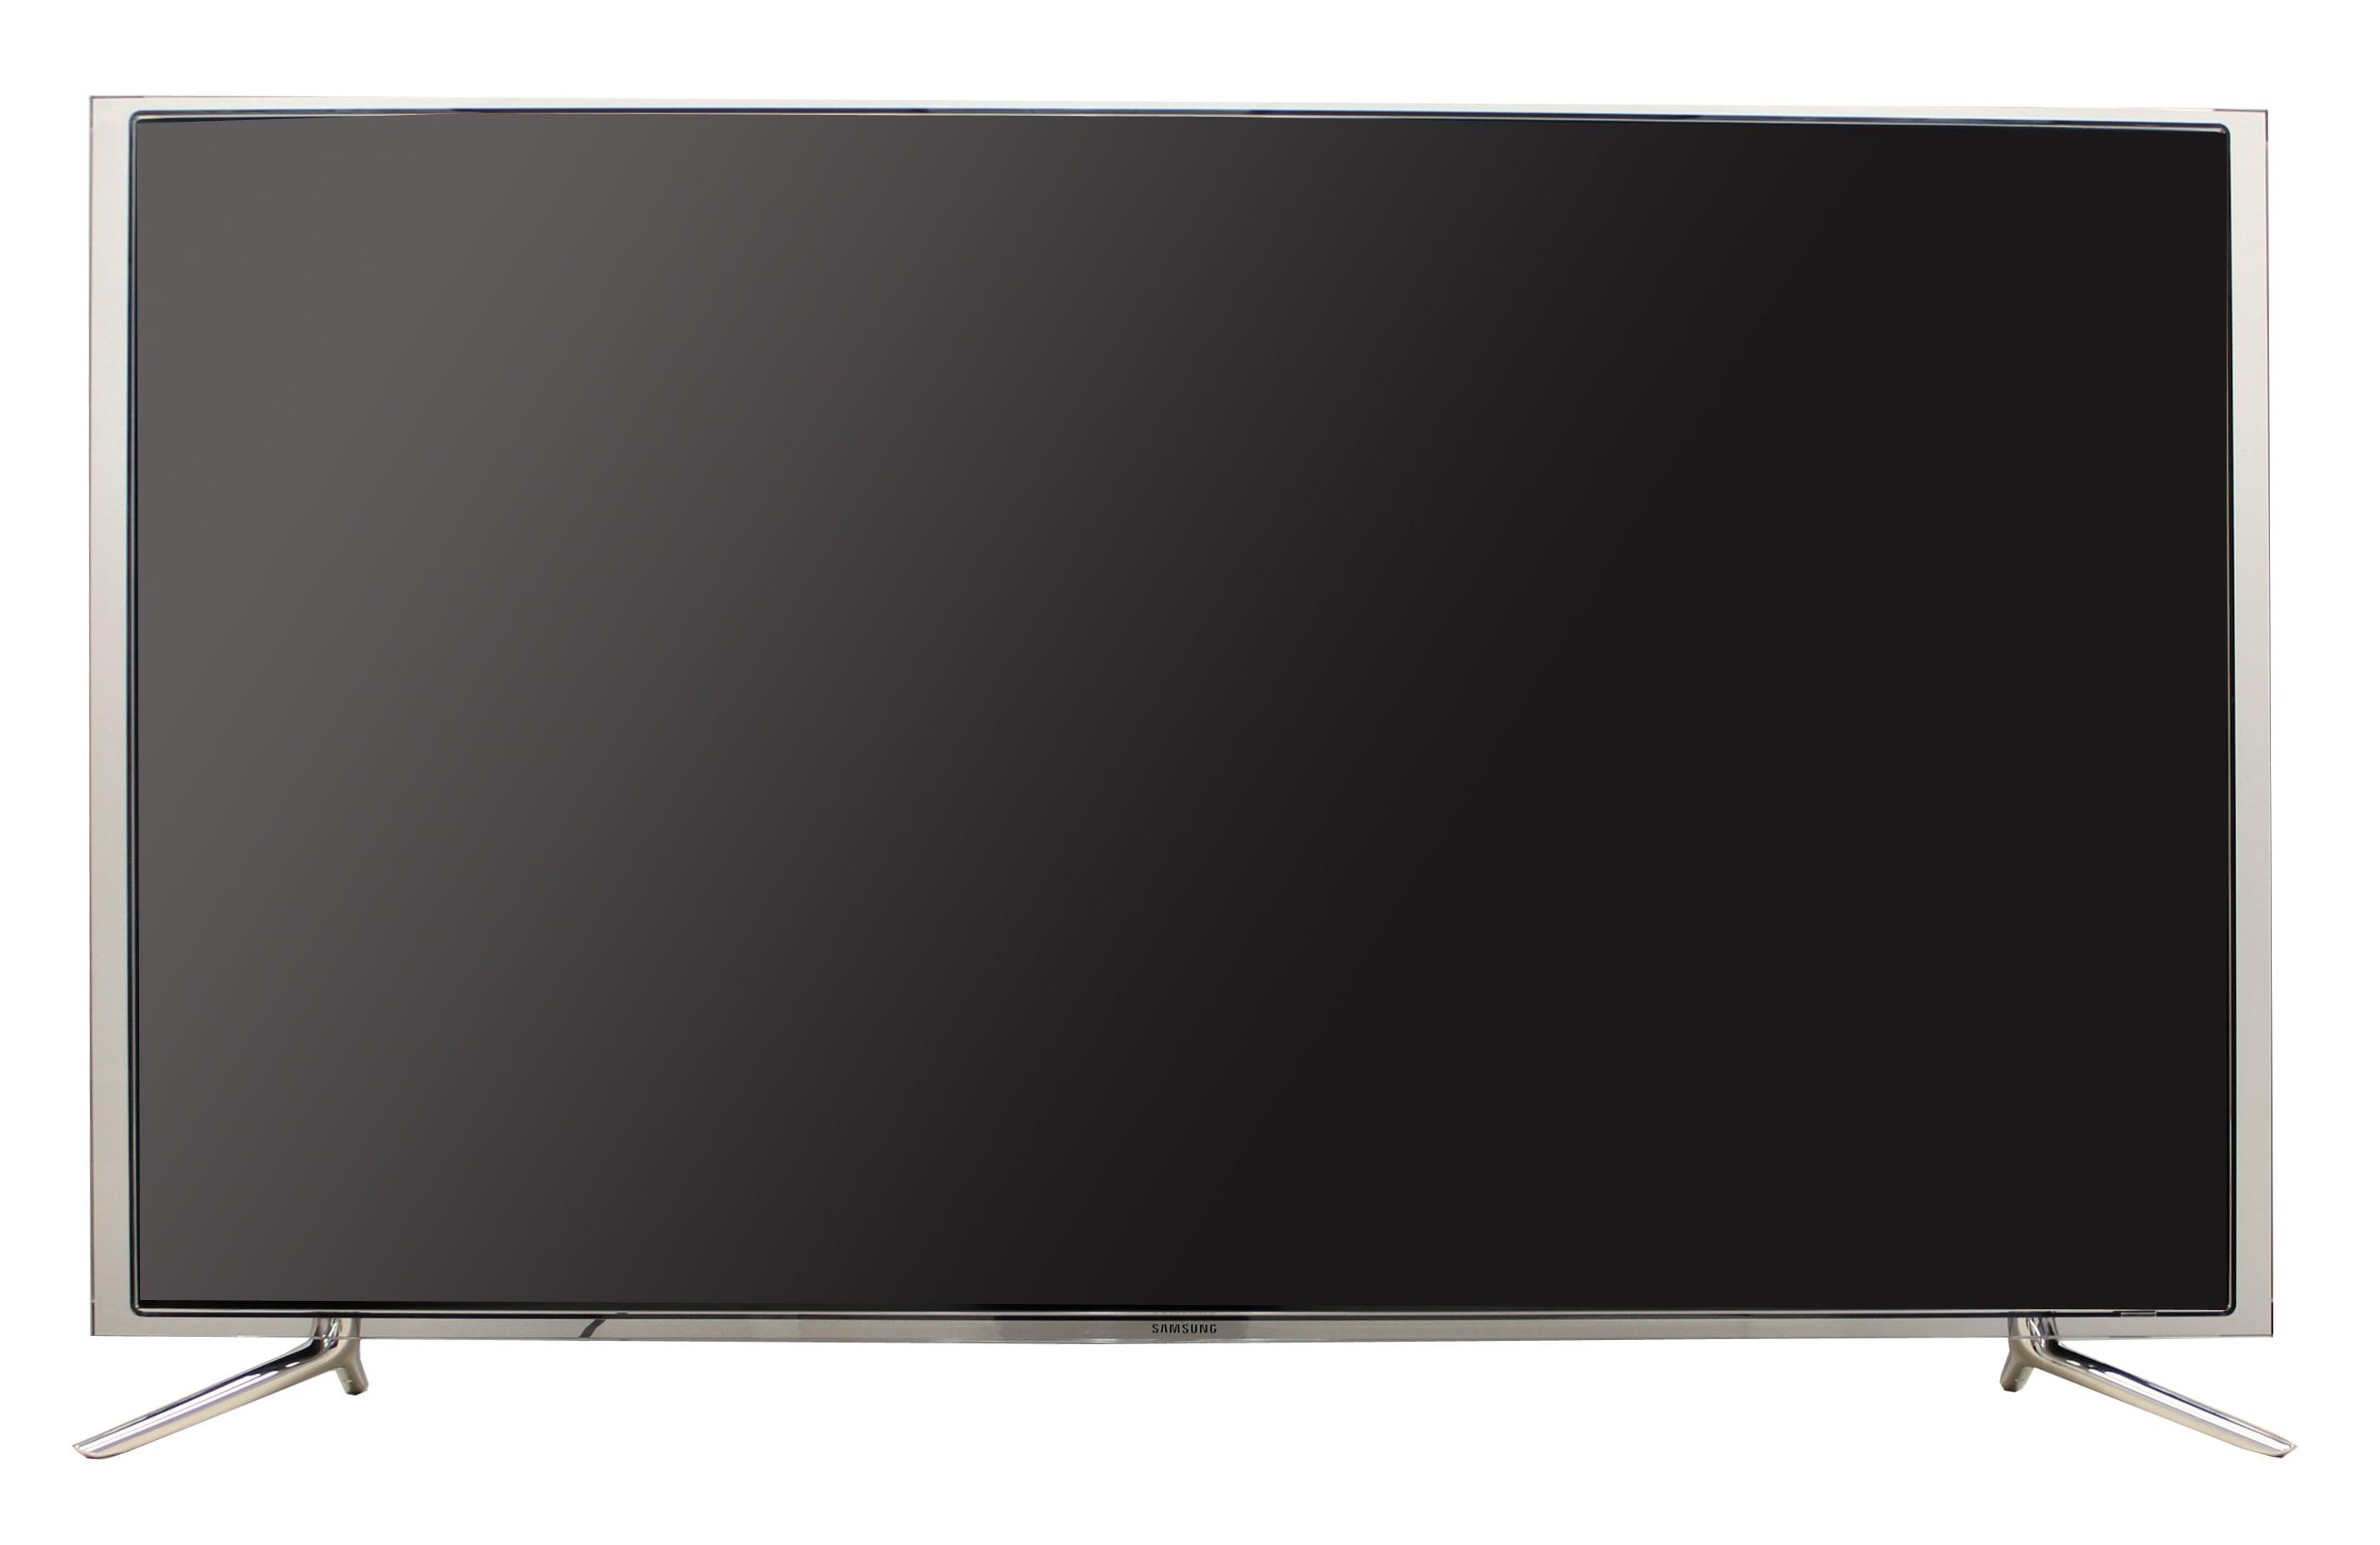 Samsung UN55F6800AF LED TV 64 Bit